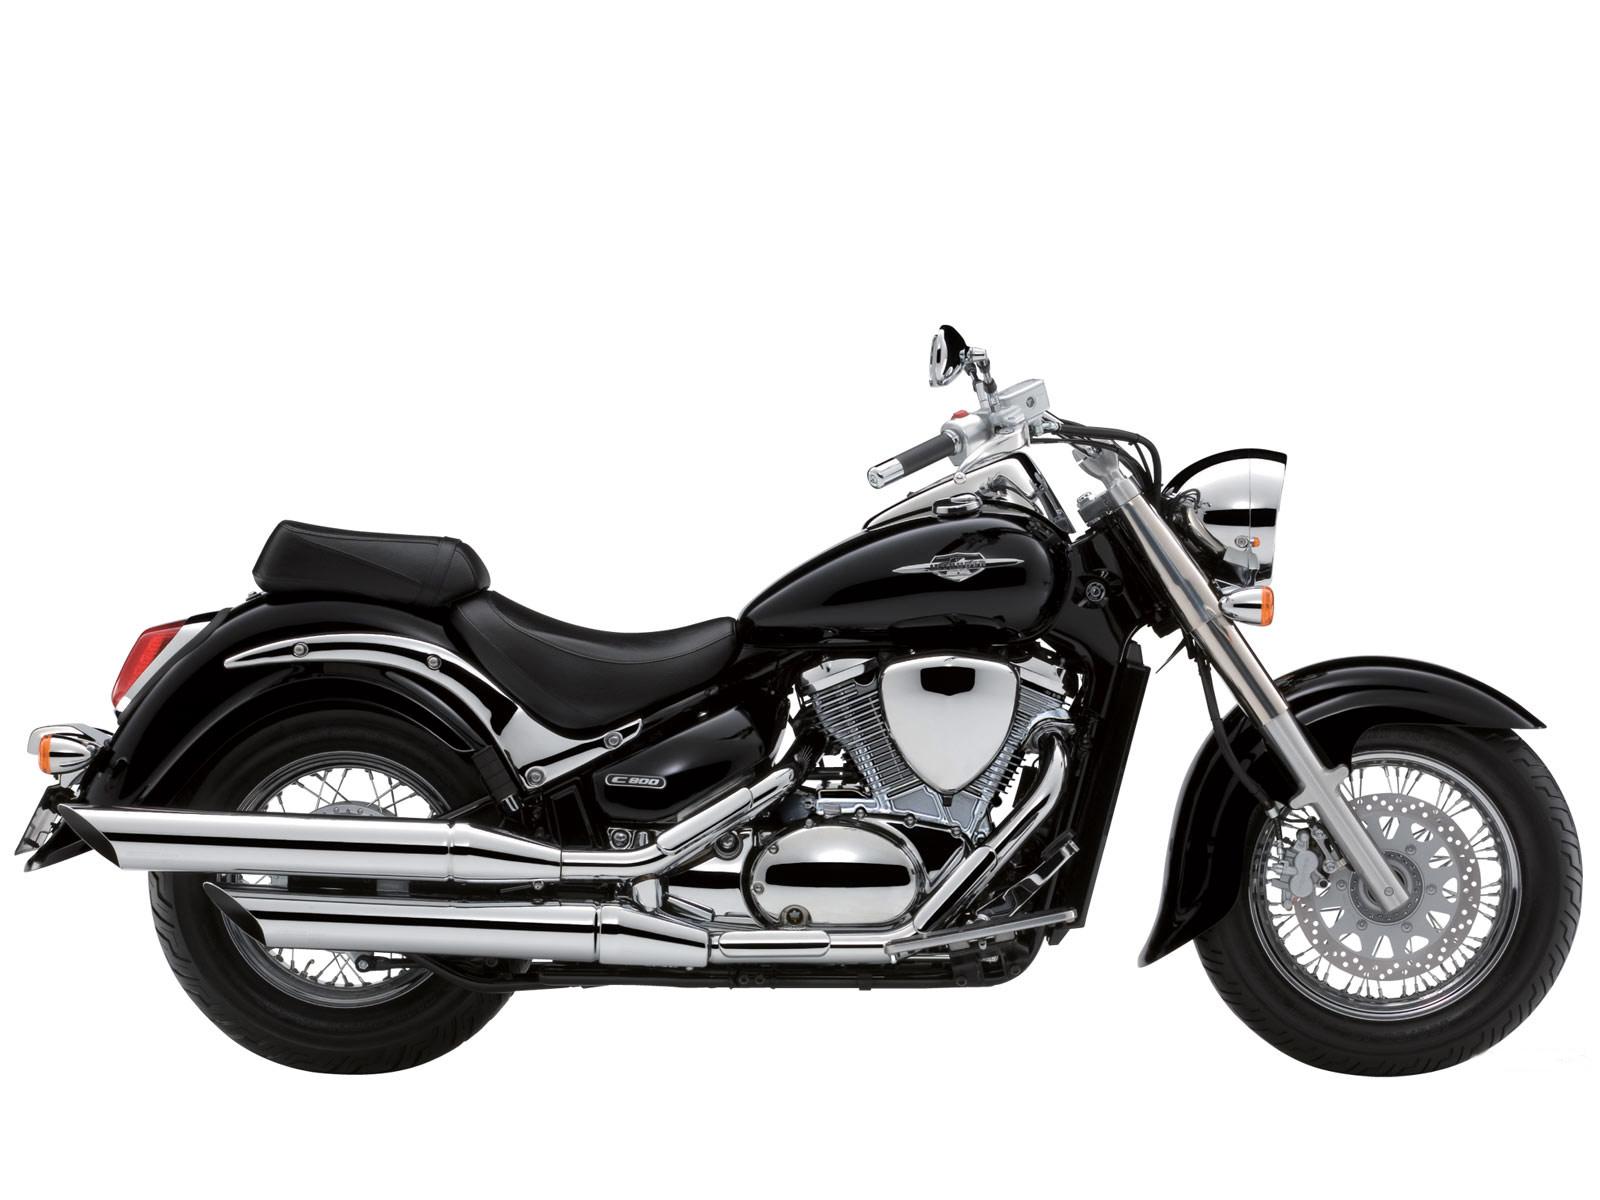 2011 suzuki vl 800 intruder volusia motorcycle photos. Black Bedroom Furniture Sets. Home Design Ideas